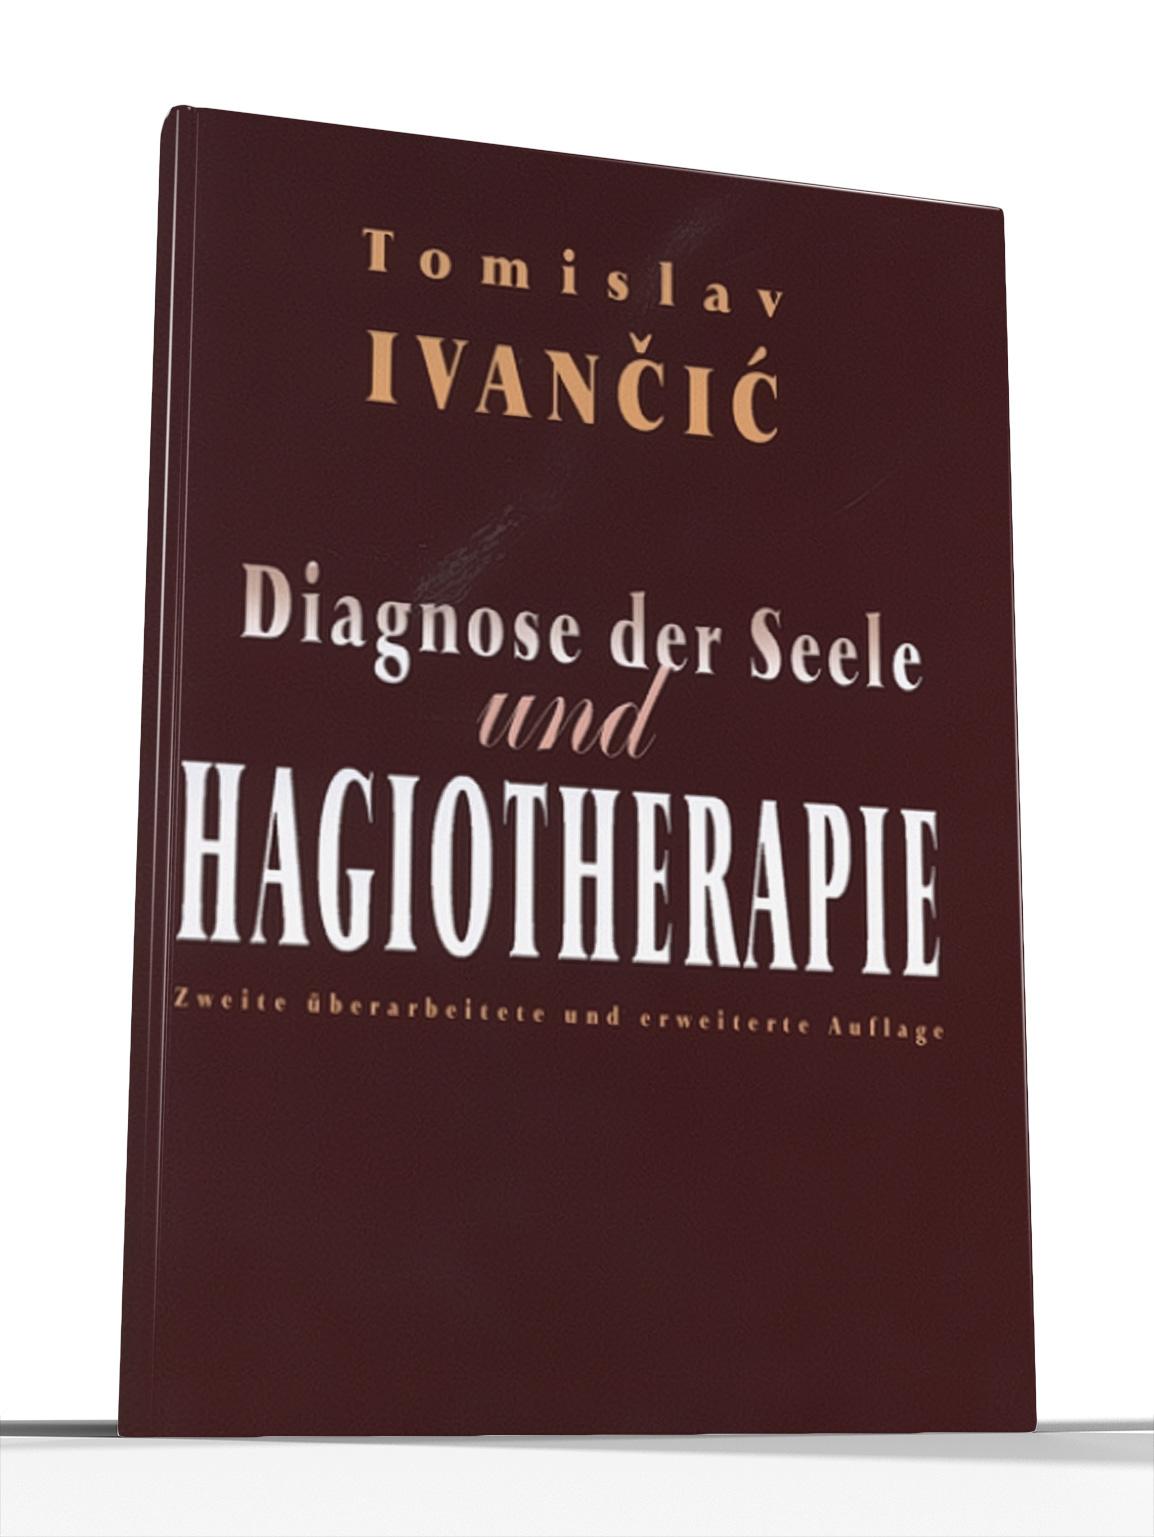 DIAGNOSE DER SEELE UND HAAIOTHERAPIE - Tomislav Ivančić